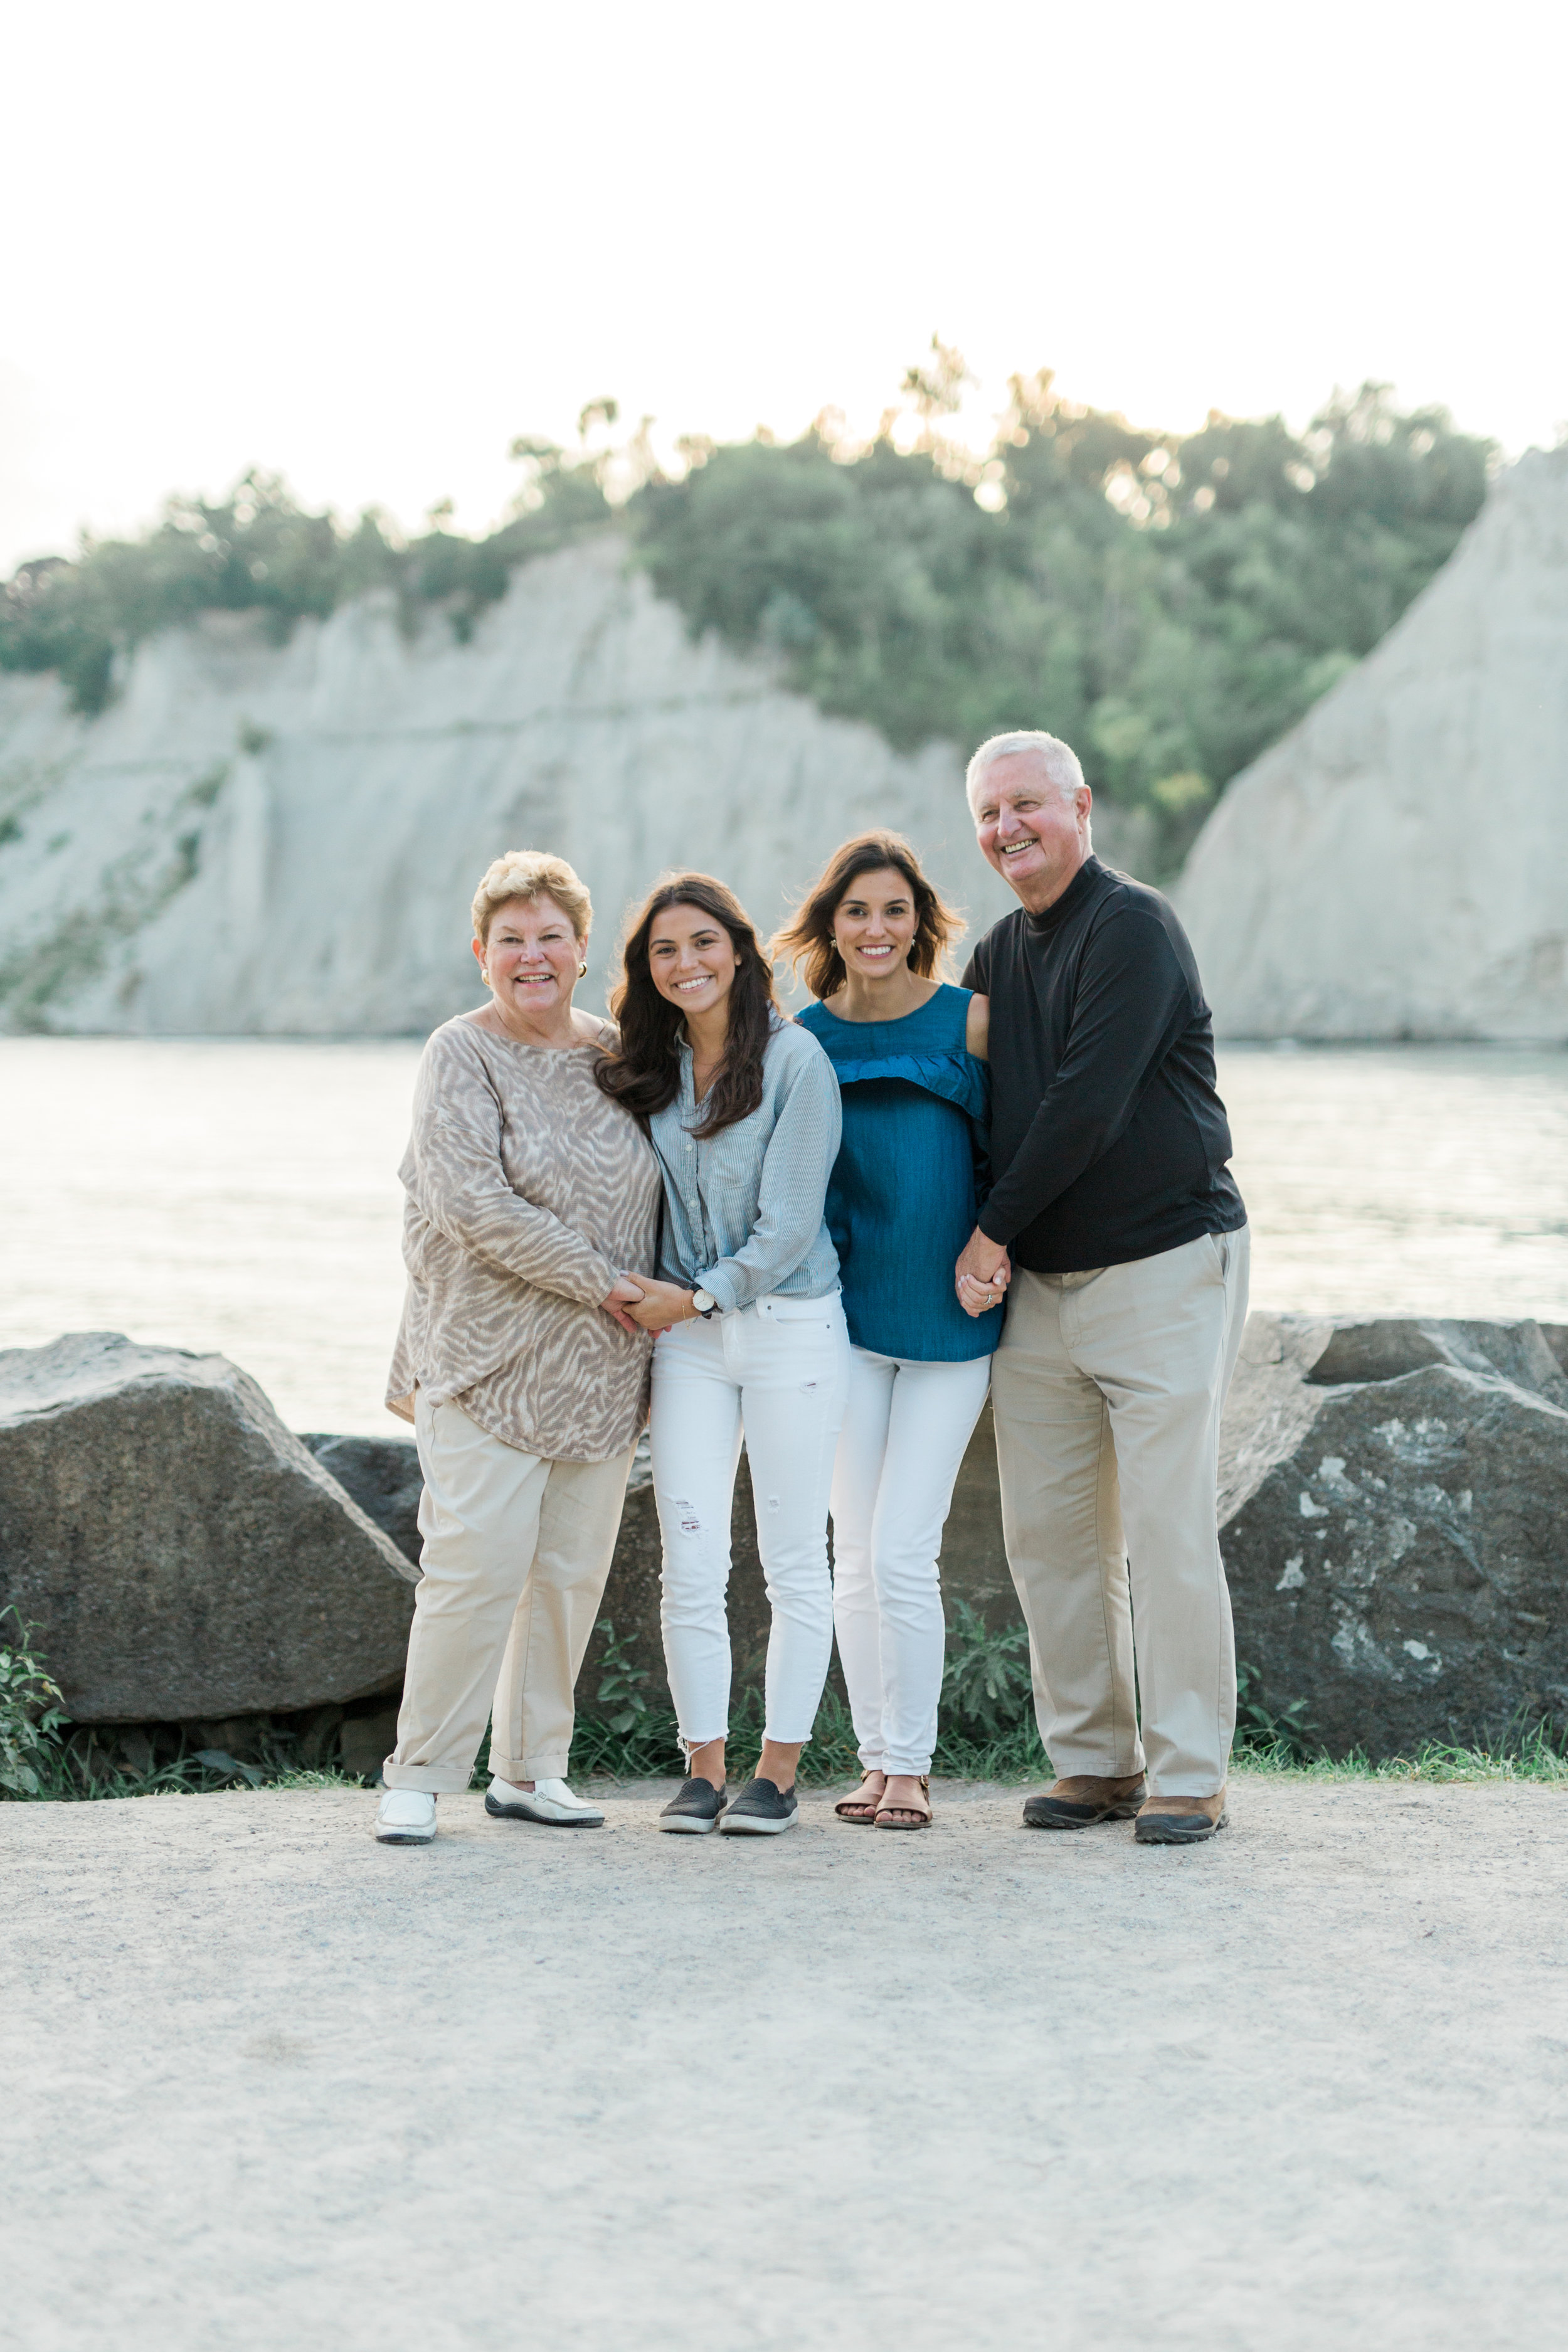 Danielle-Giroux-Amir-Golbazi-Genua-Family-Photography-Scarborough-Bluffs-9437.jpg